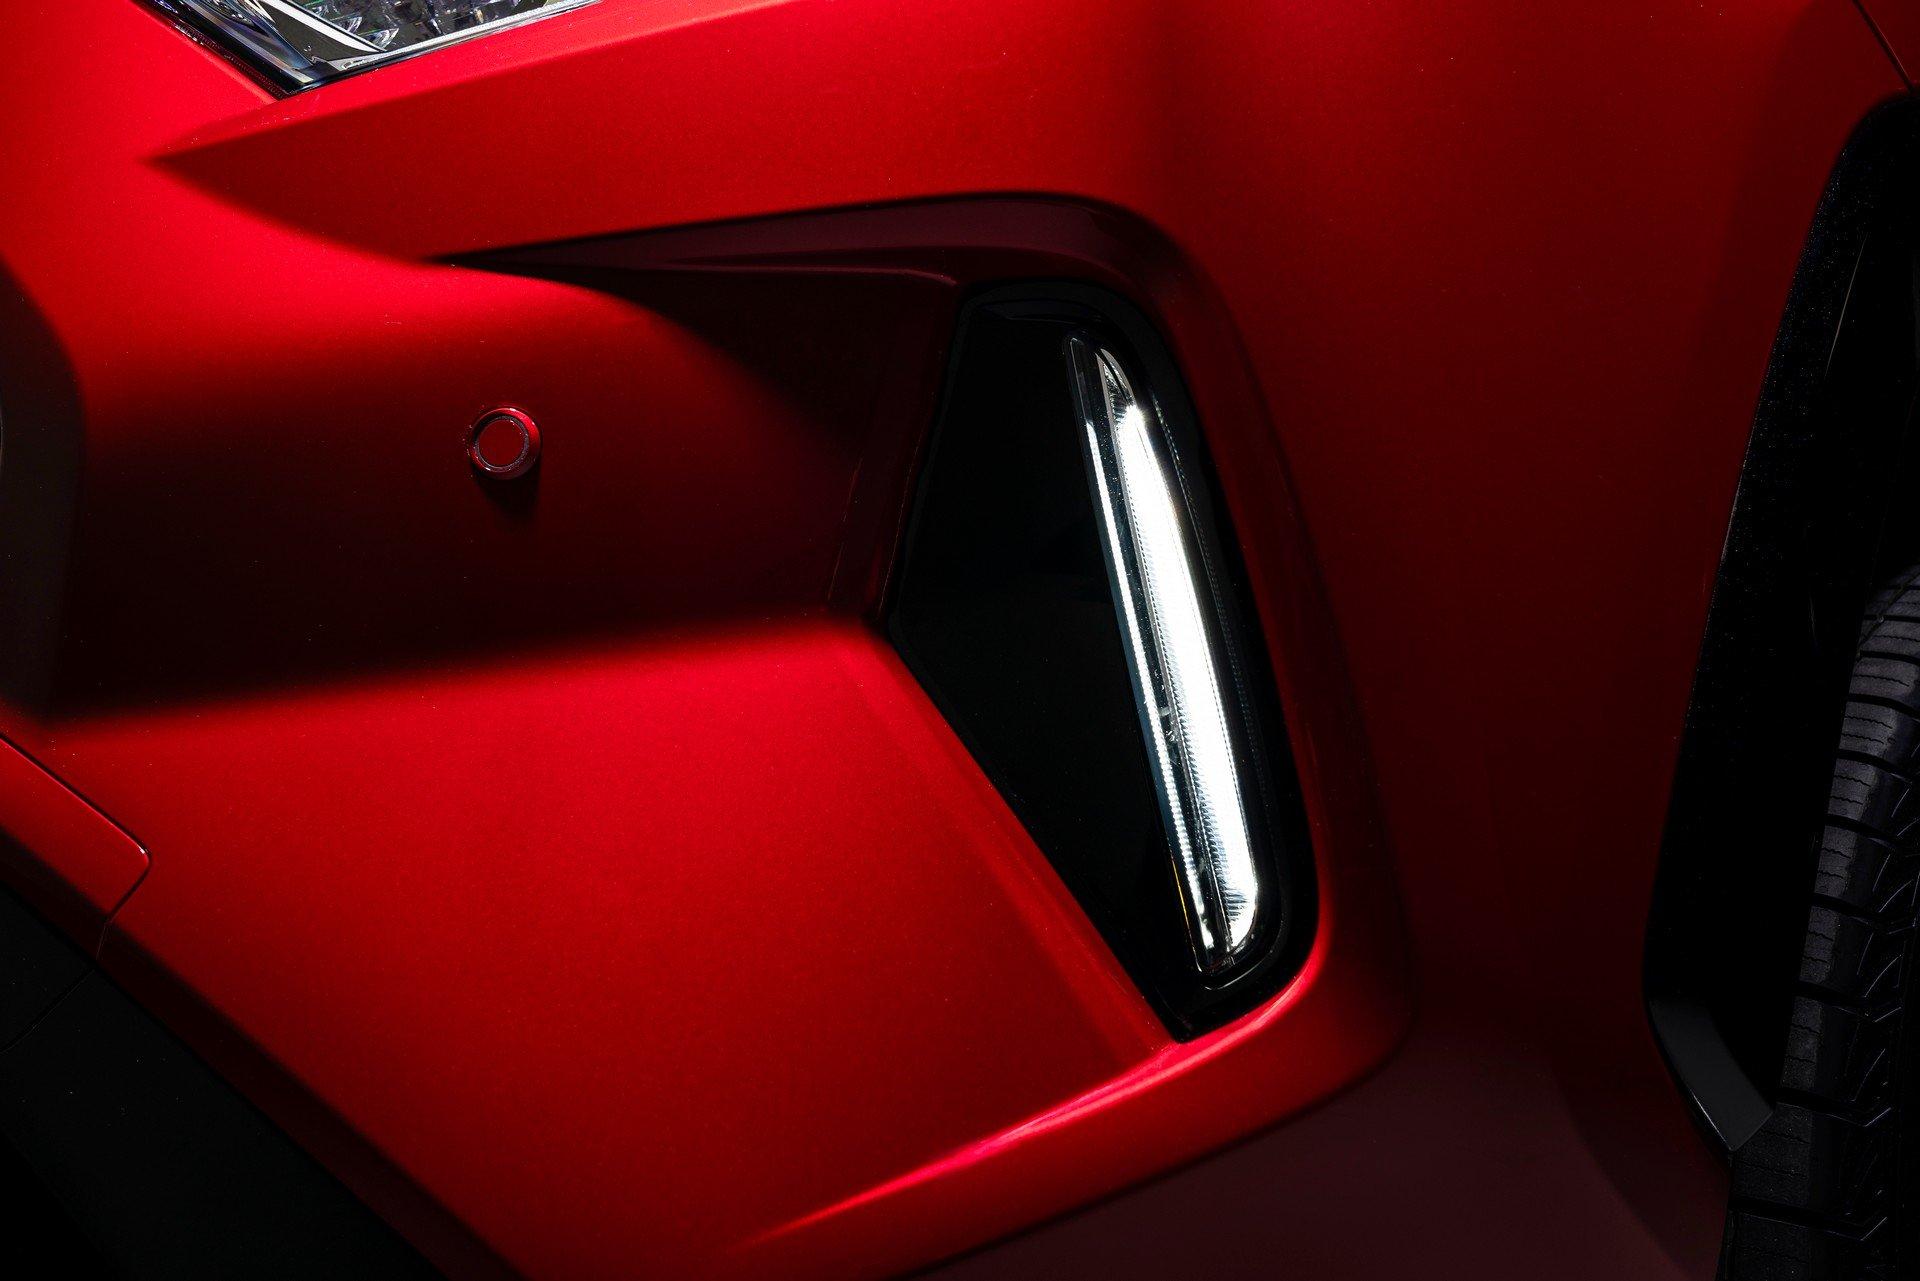 Toyota-RAV4-Plug-in-Hybrid-Prime-2020-19